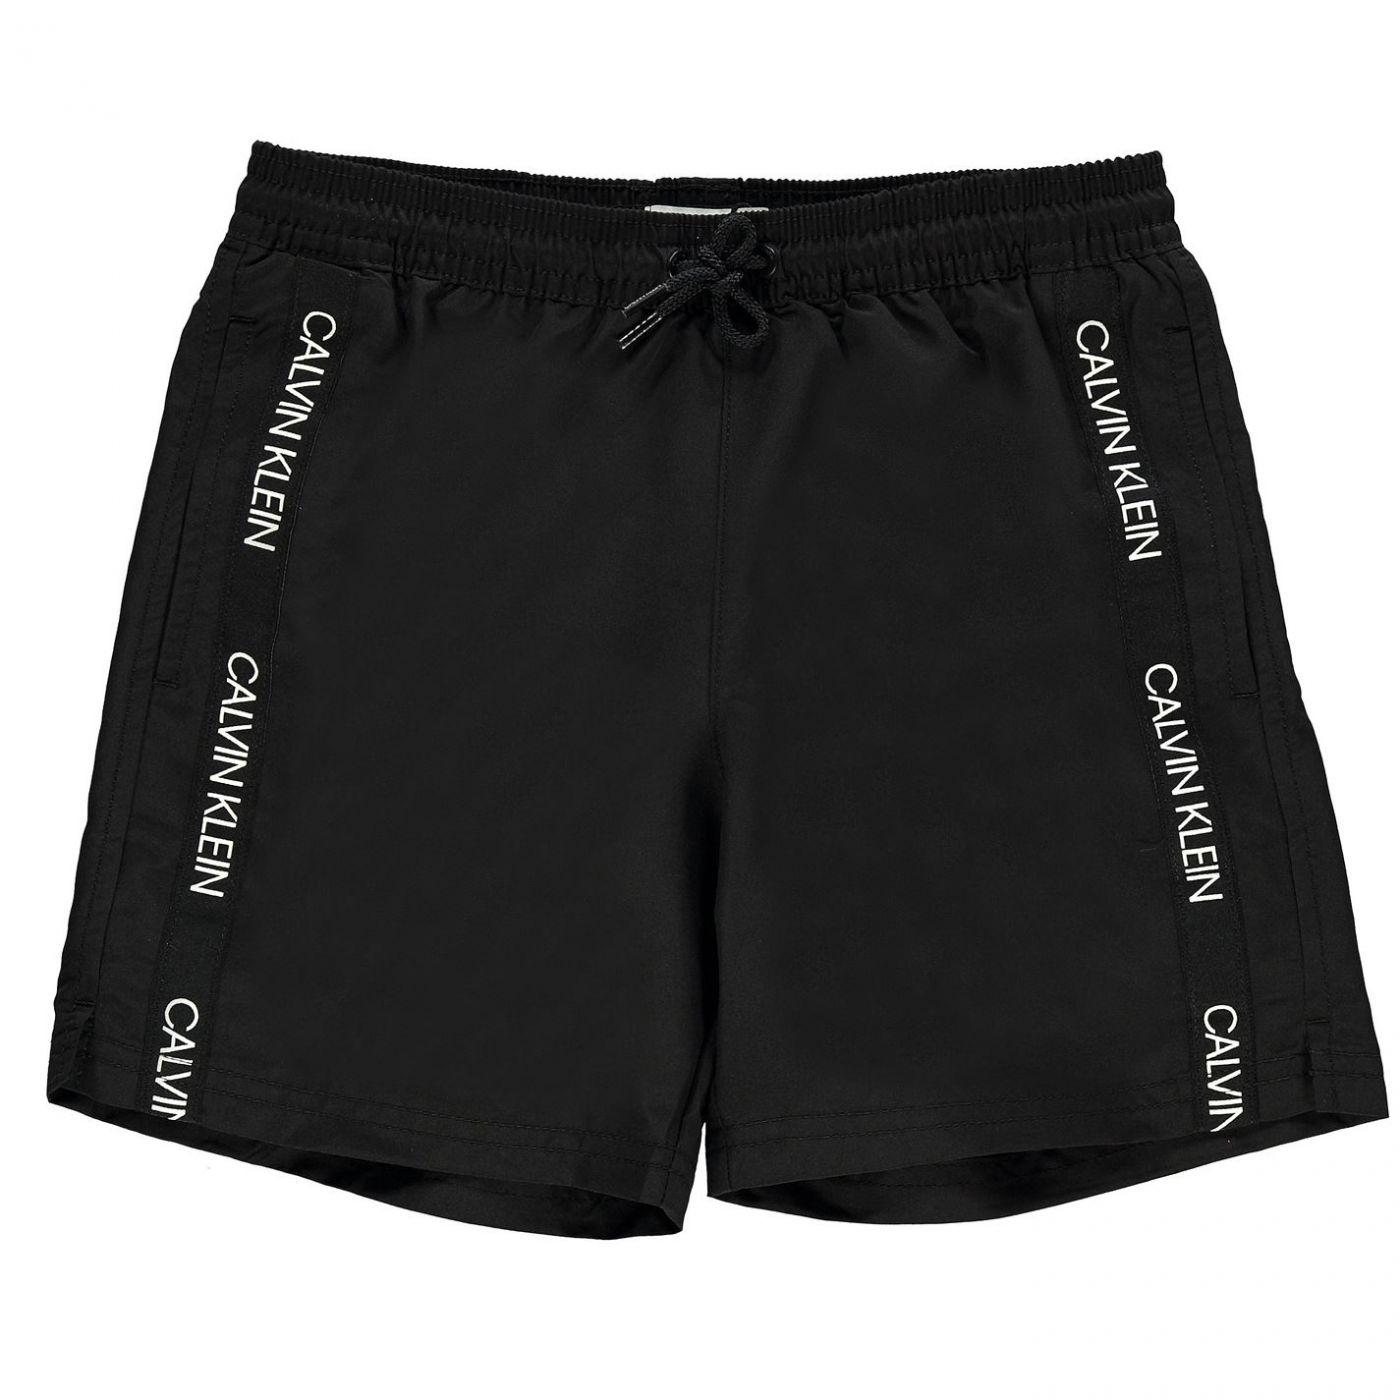 Calvin Klein Boy's Tapered Swimming Trunks